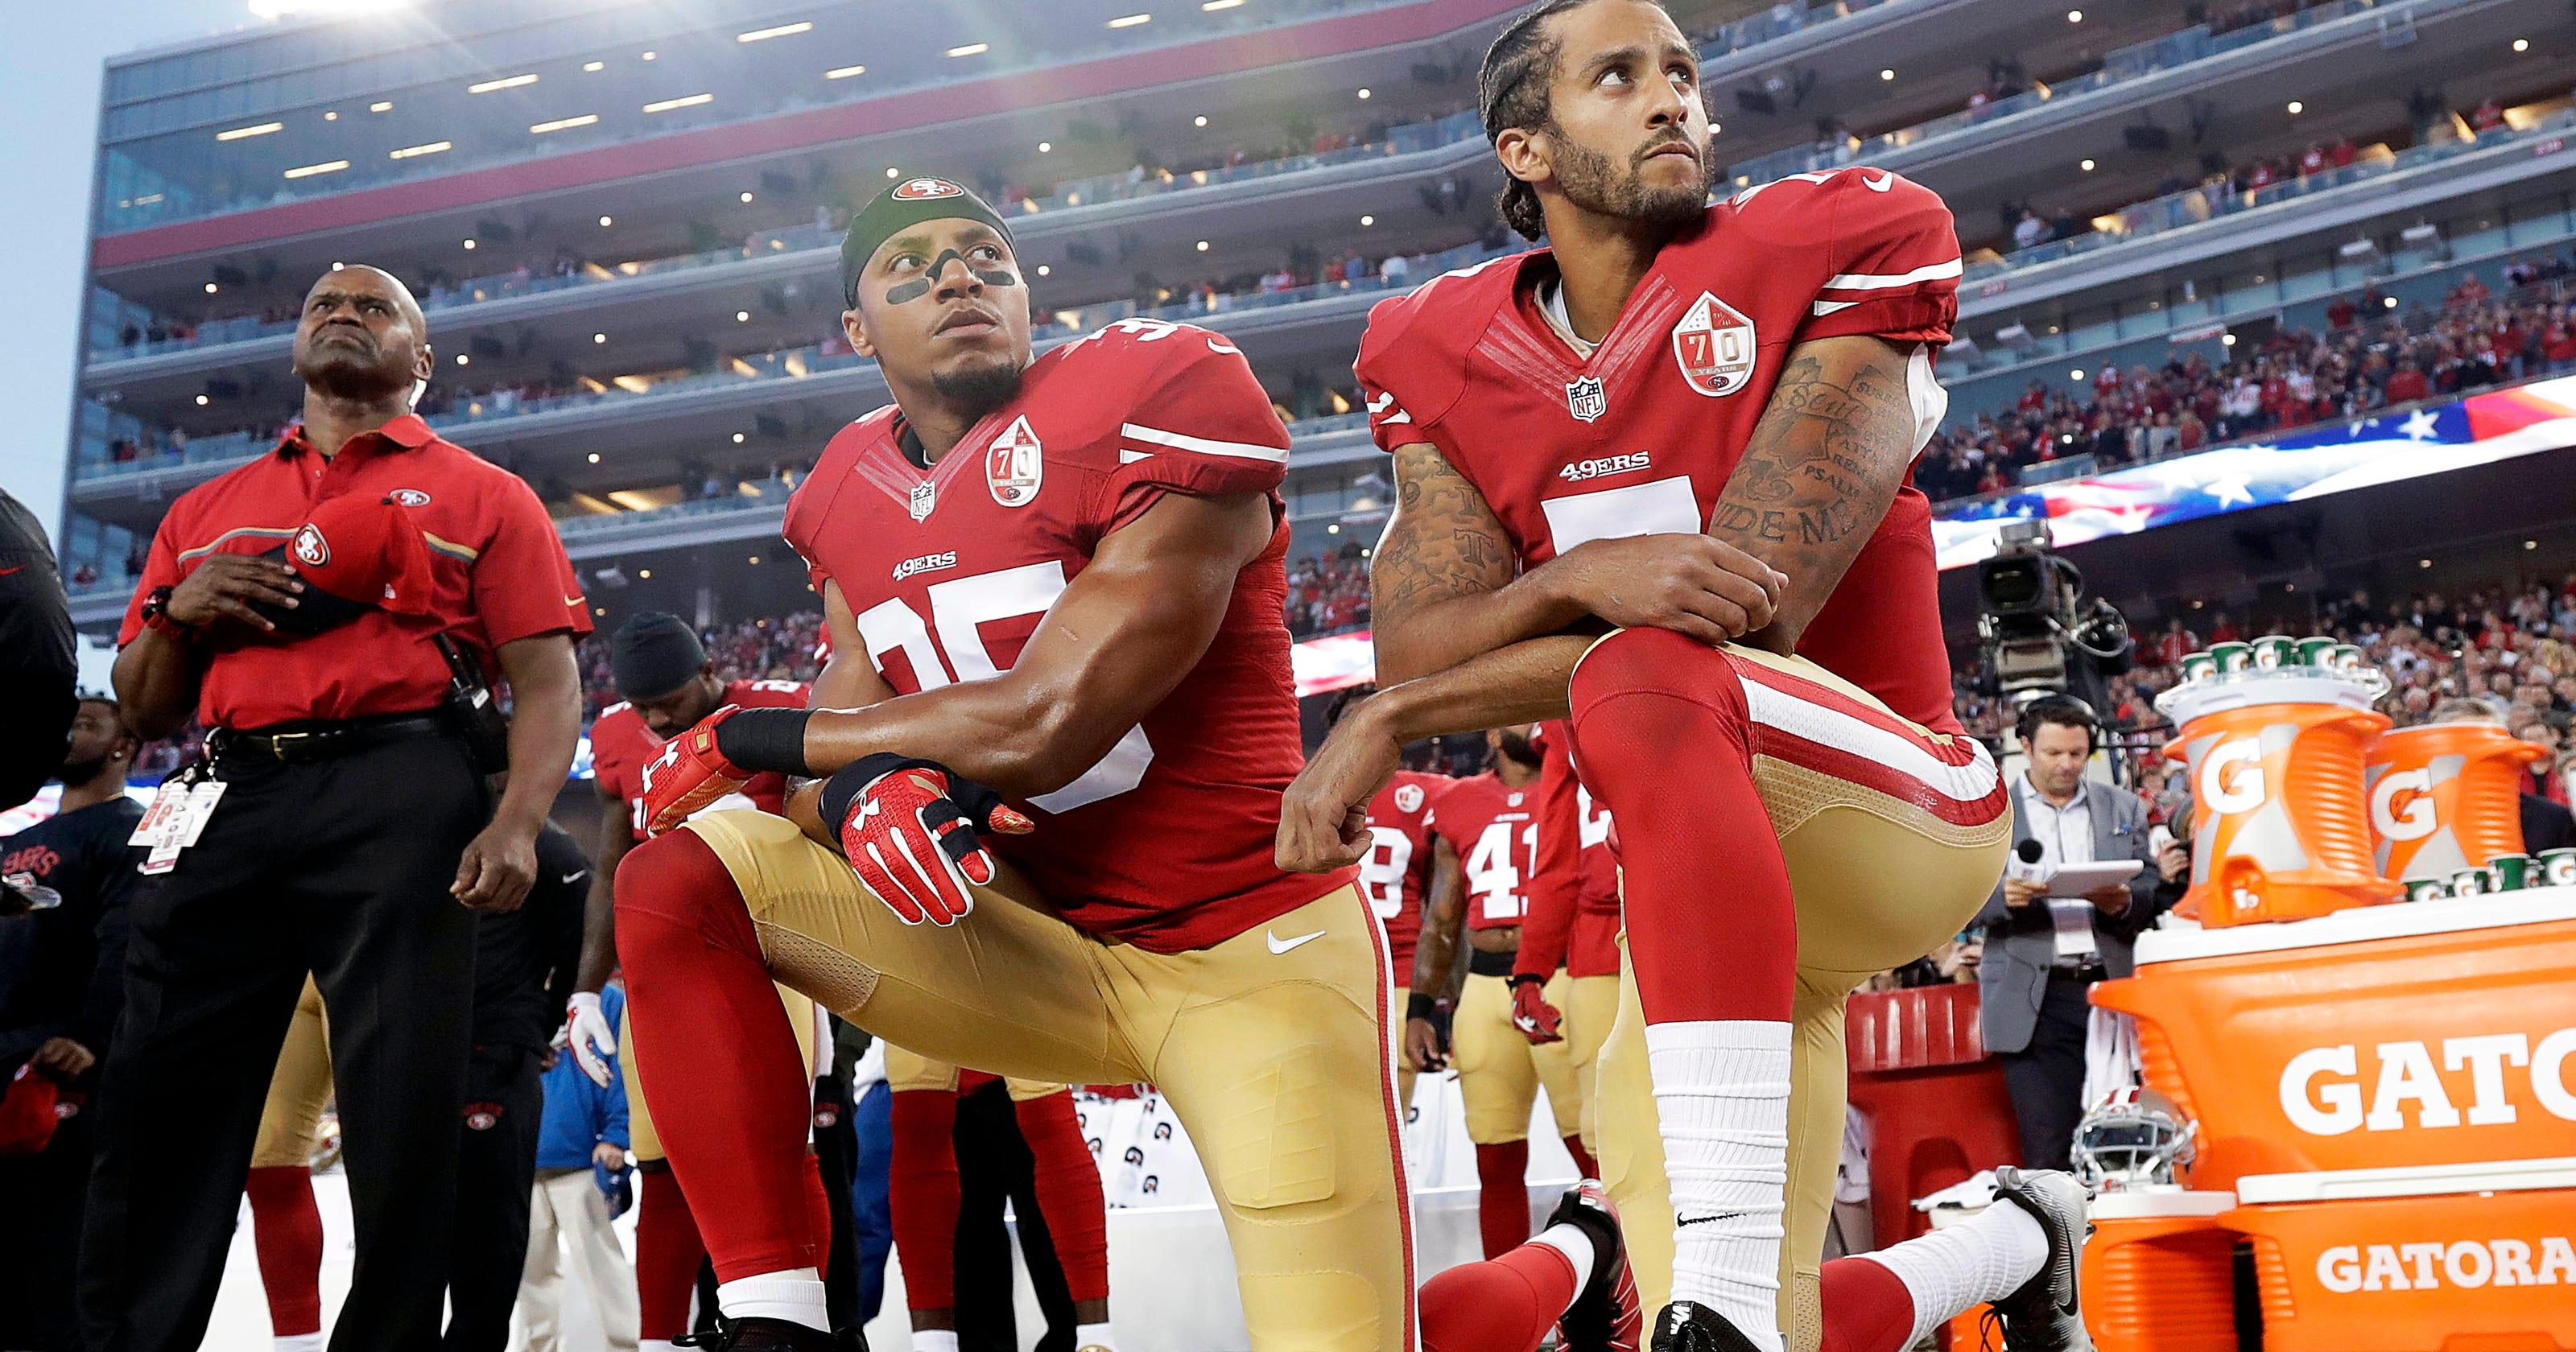 35ed444ec4340 Veterans differ in views of kneeling during national anthem